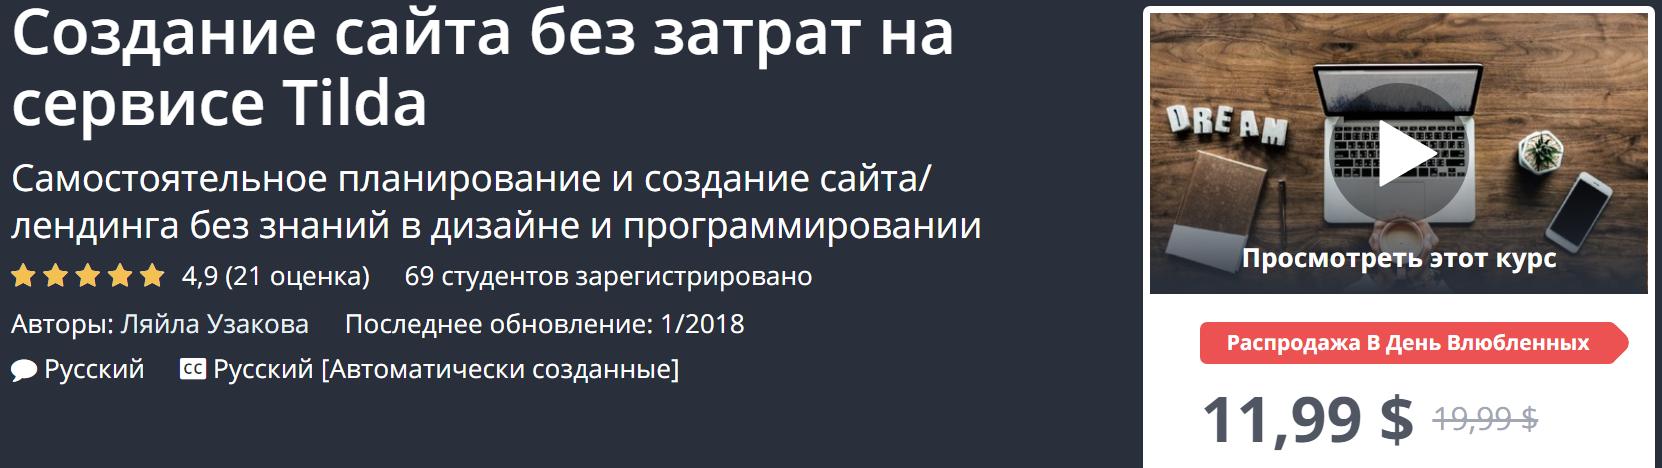 2019-02-11_19-33-48